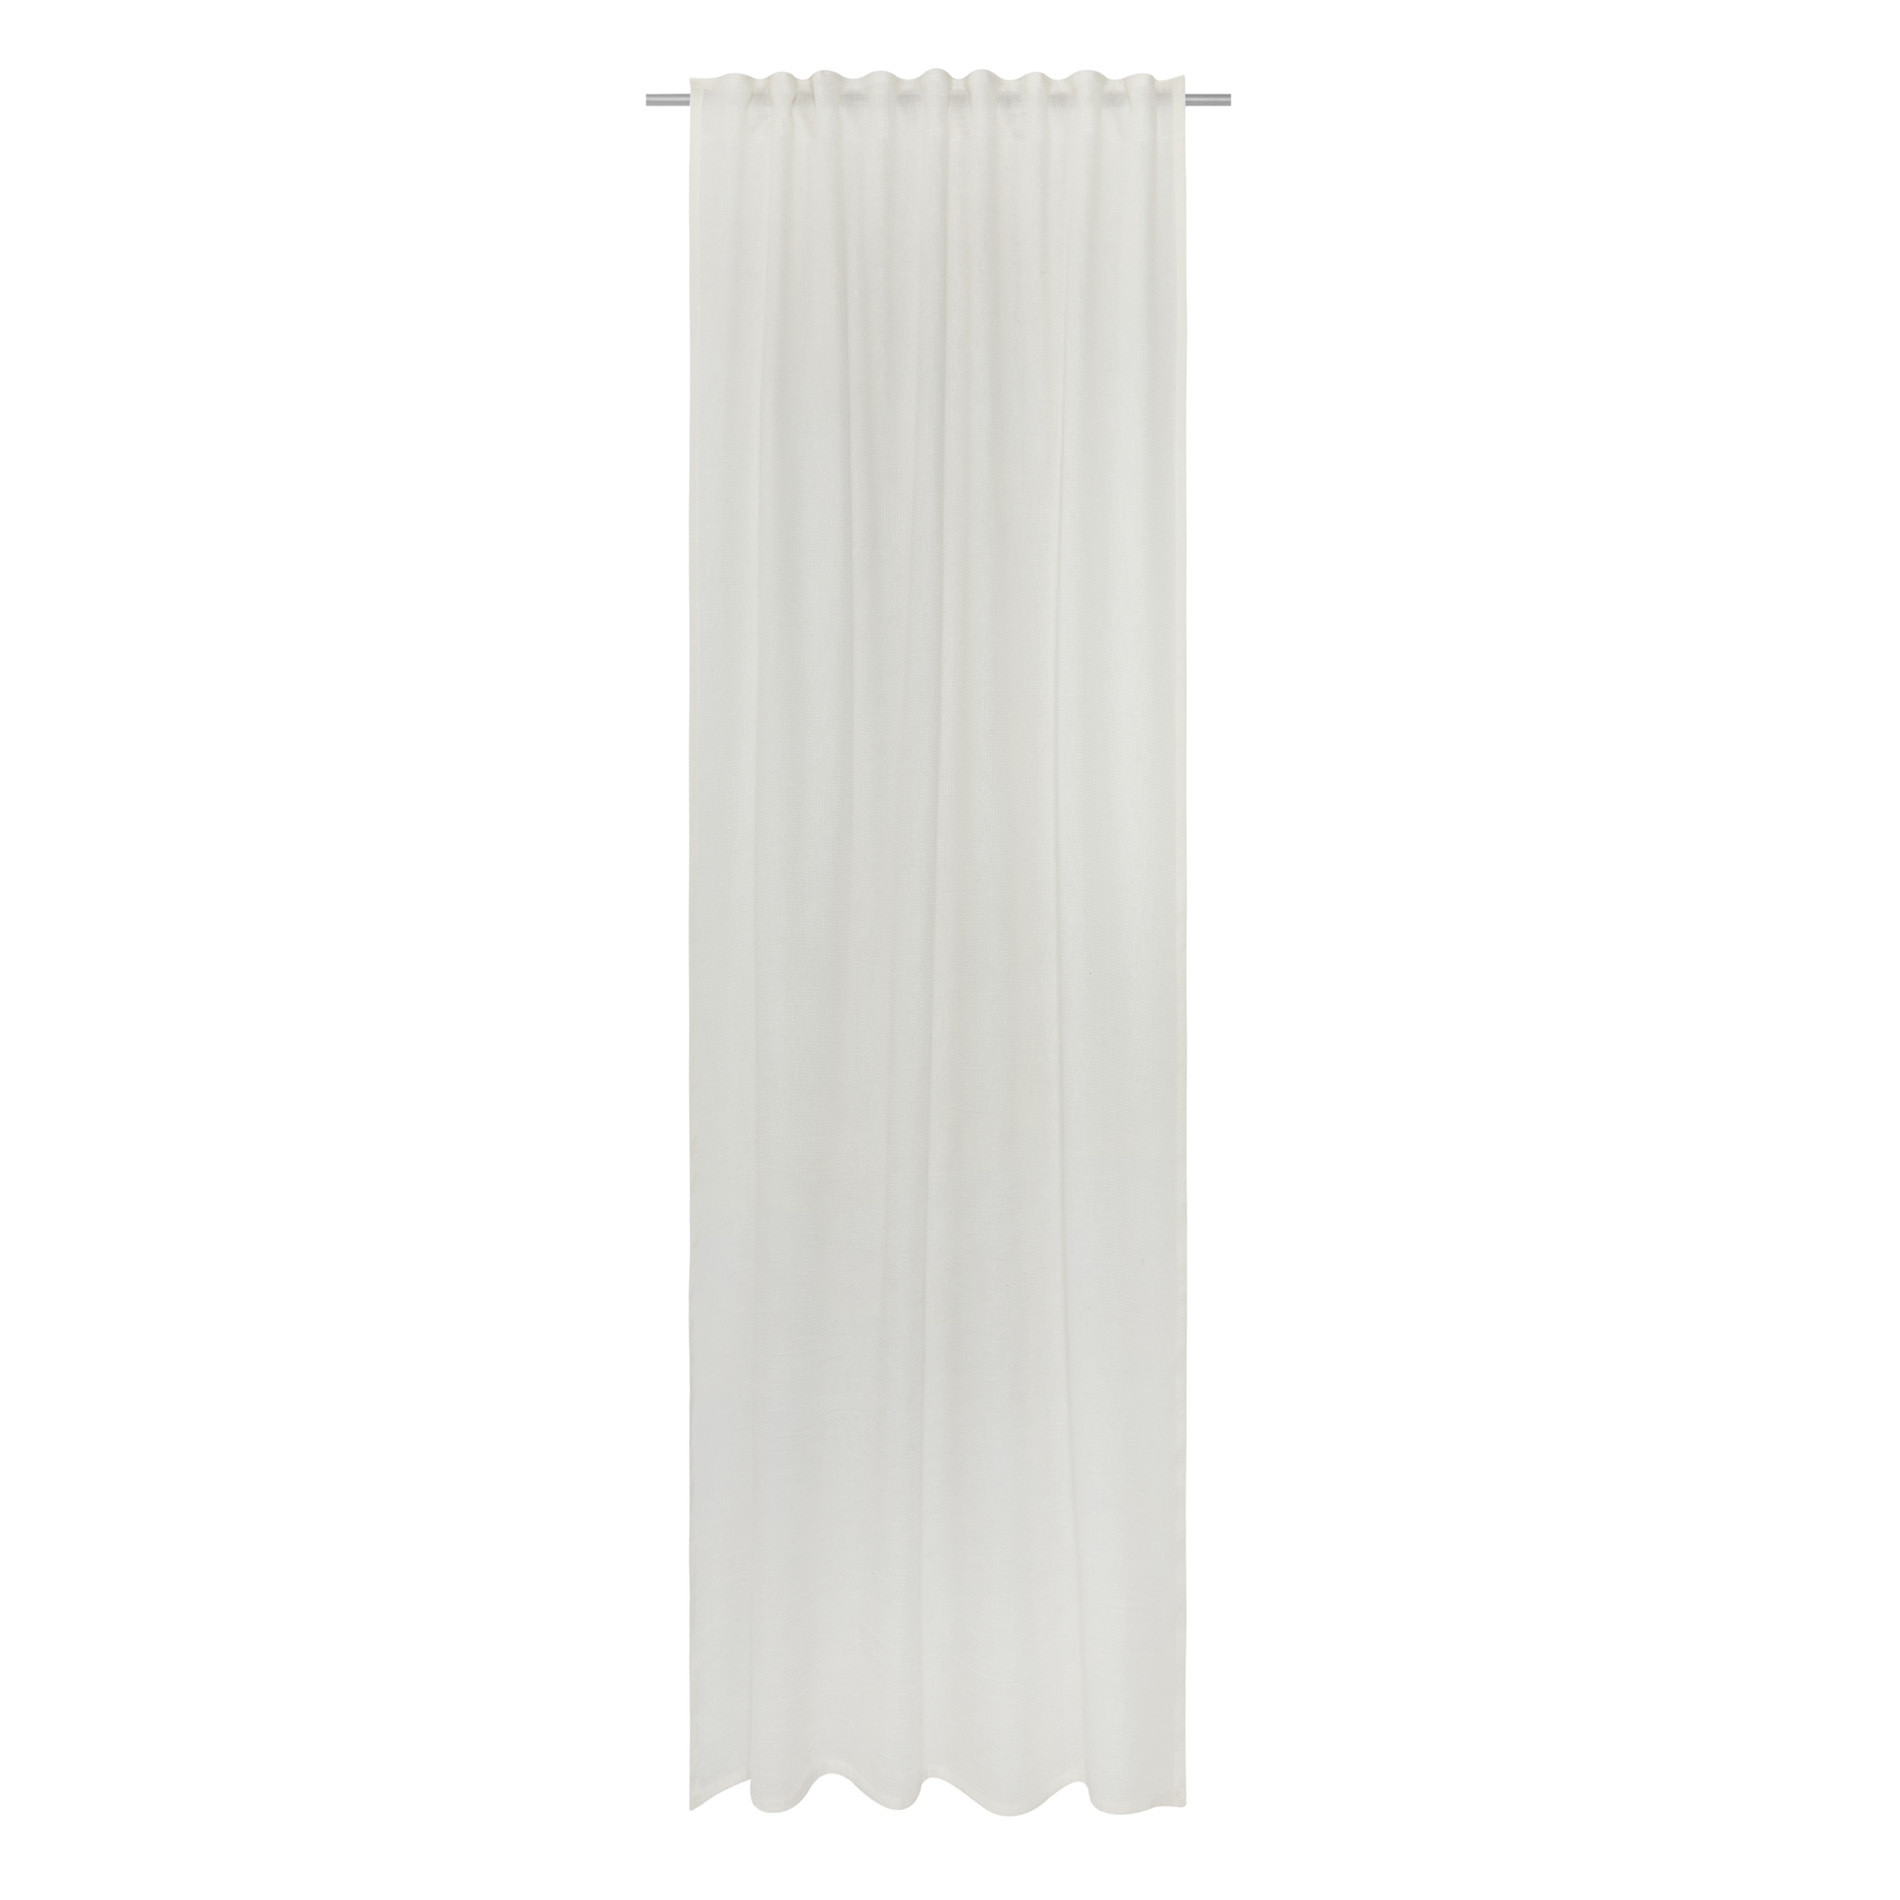 Tenda misto lino passanti nascosti, Bianco, large image number 2